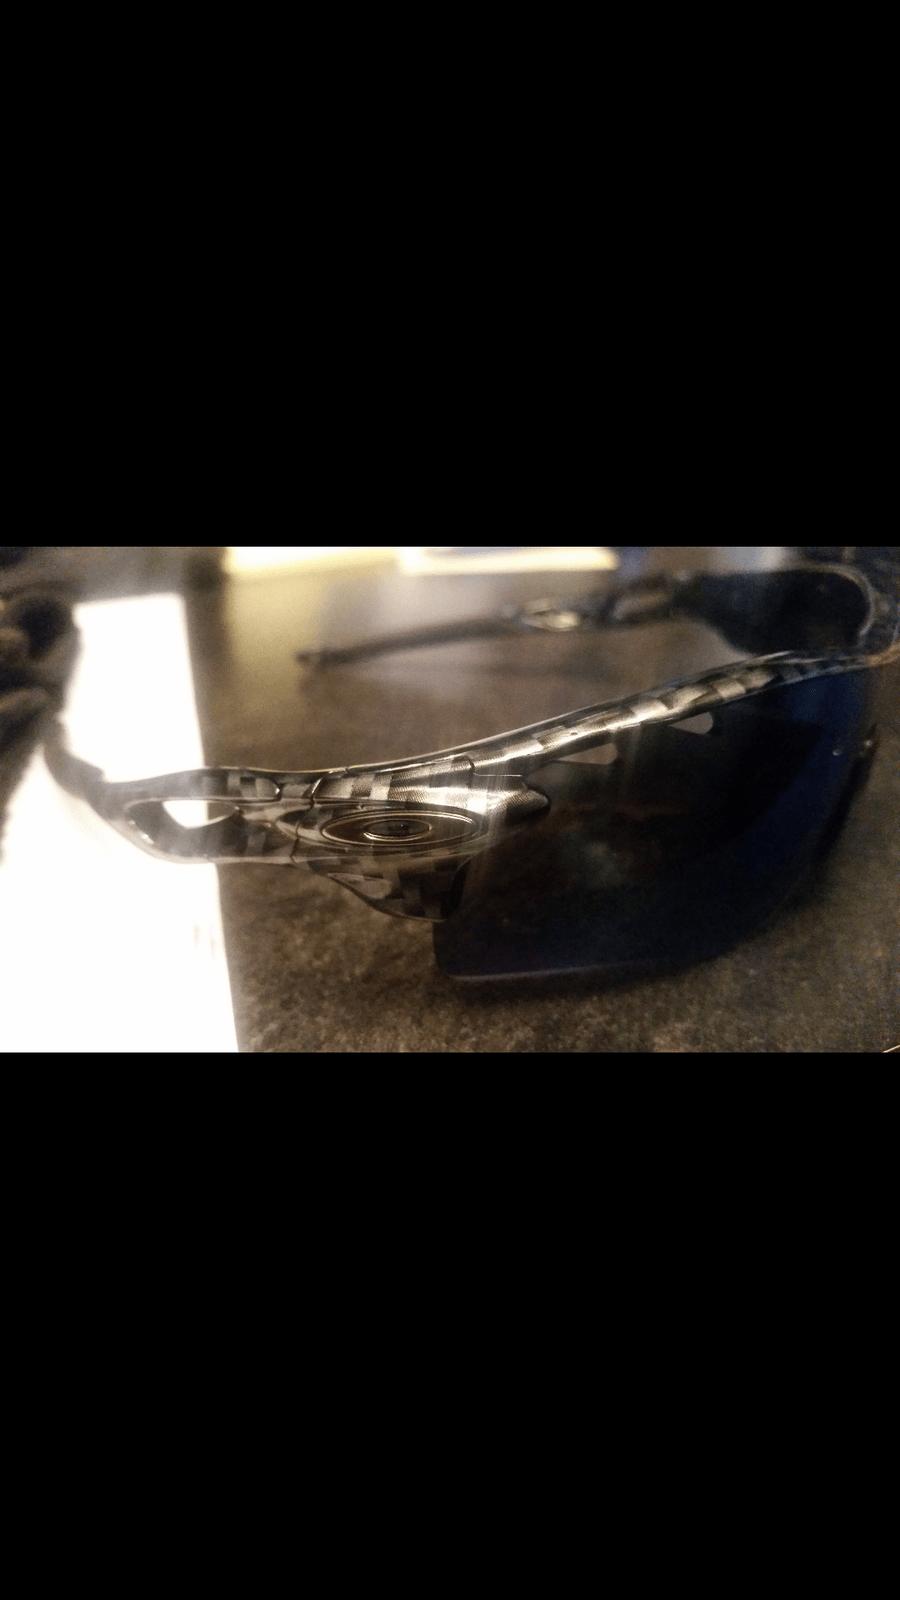 Carbon Fibre Radarlock with 6 lenses - Screenshot_2015-07-13-16-58-43.png